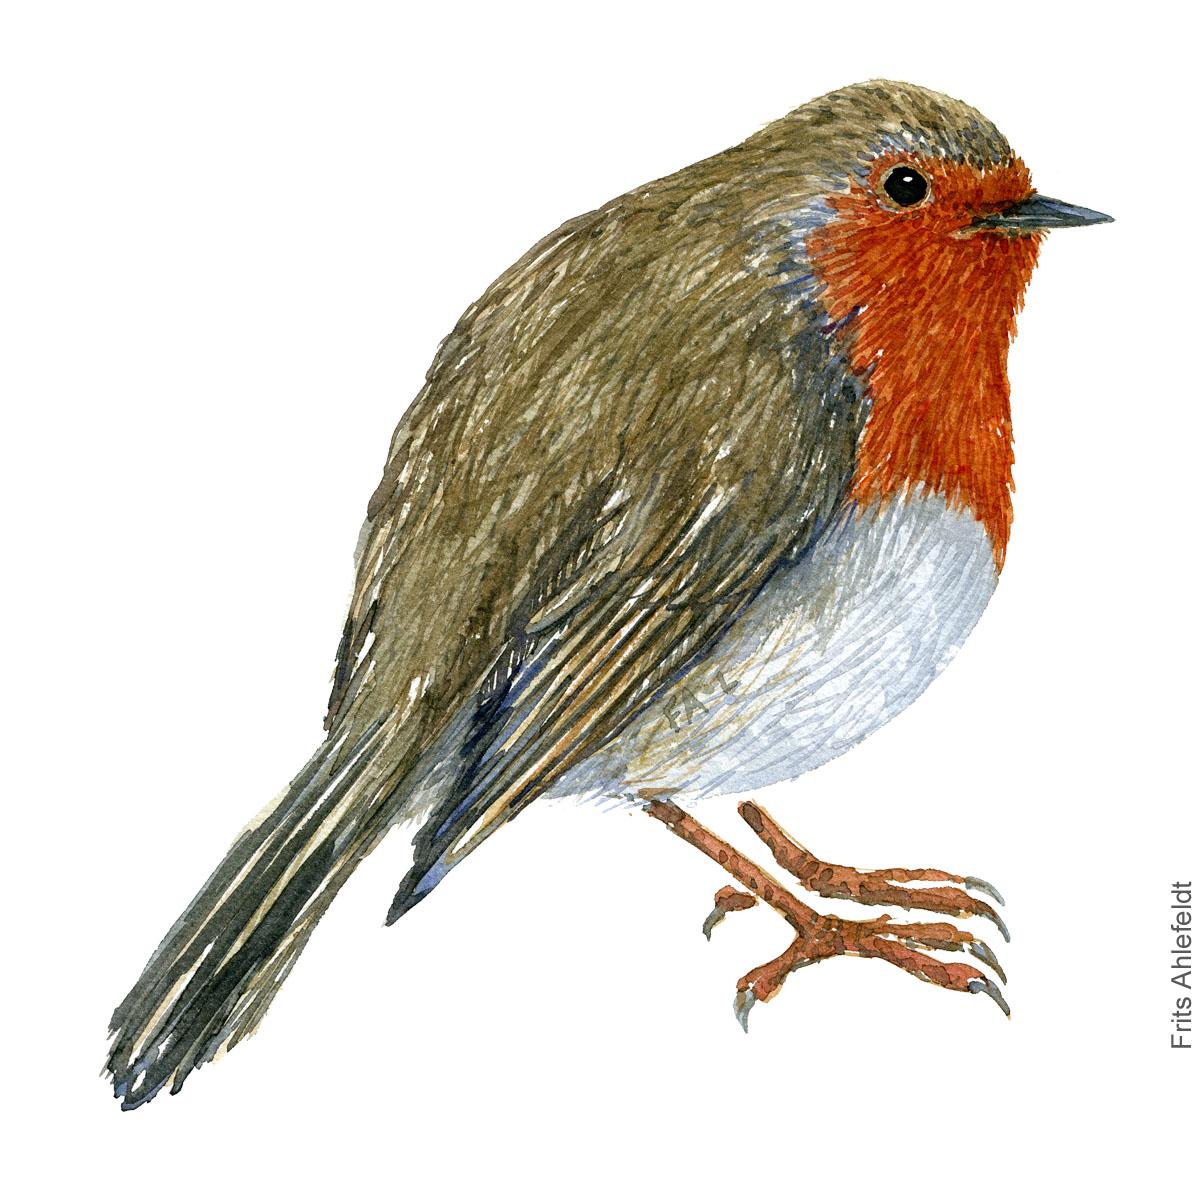 Roedhals - European robin - Bird watercolor painting. Artwork by Frits Ahlefeldt. Fugle akvarel